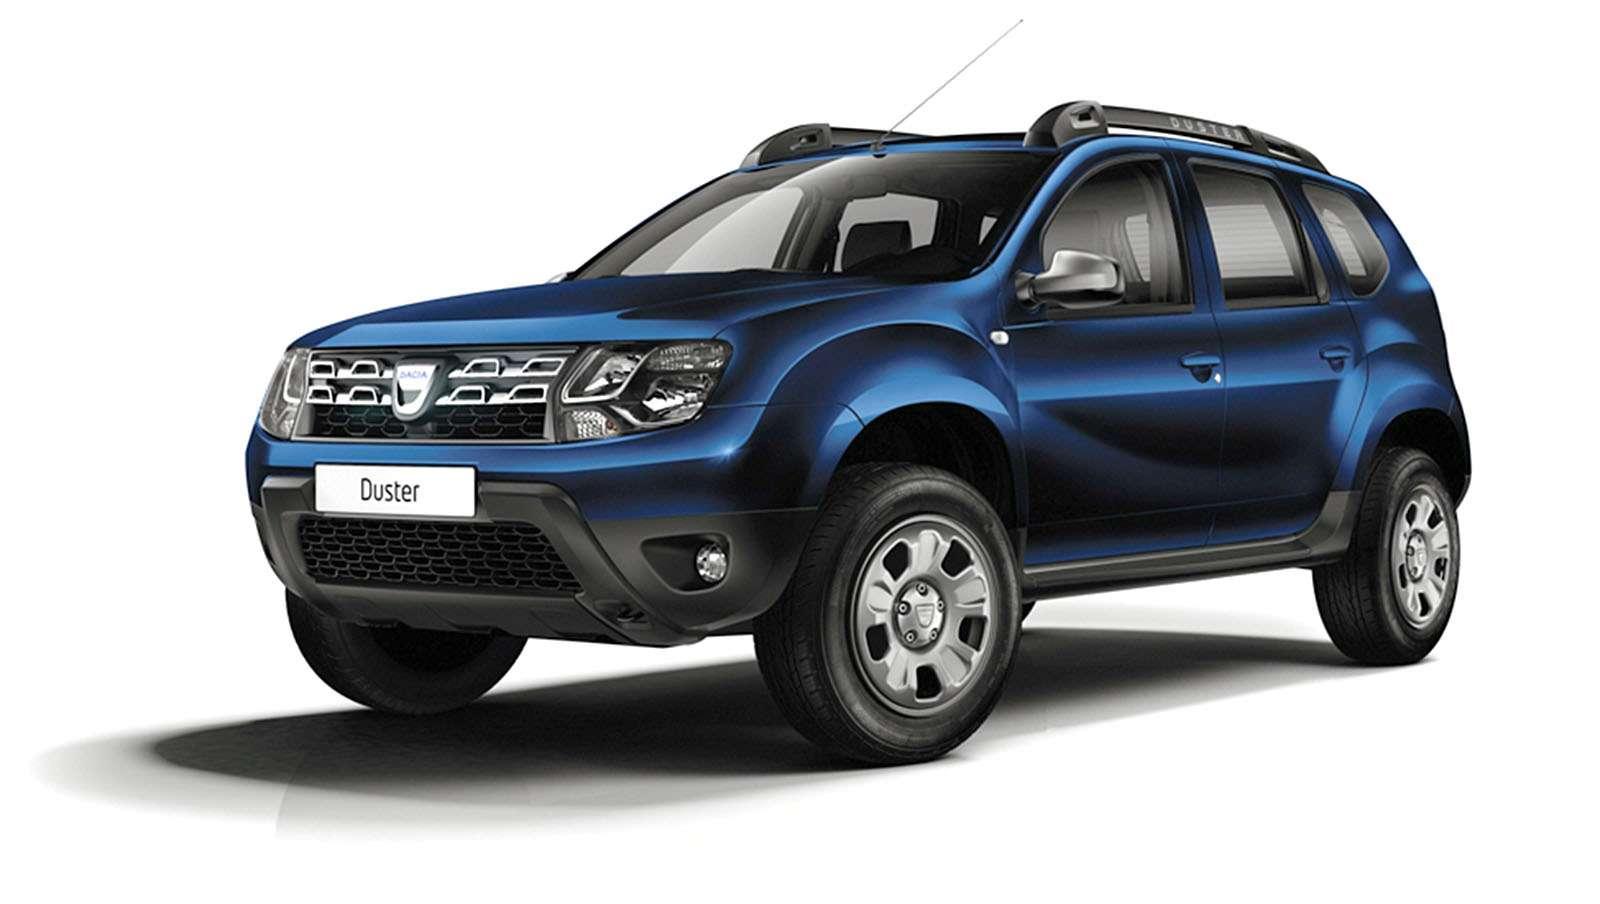 Dacia-Duster-anniversary-edition-front-three-quarter